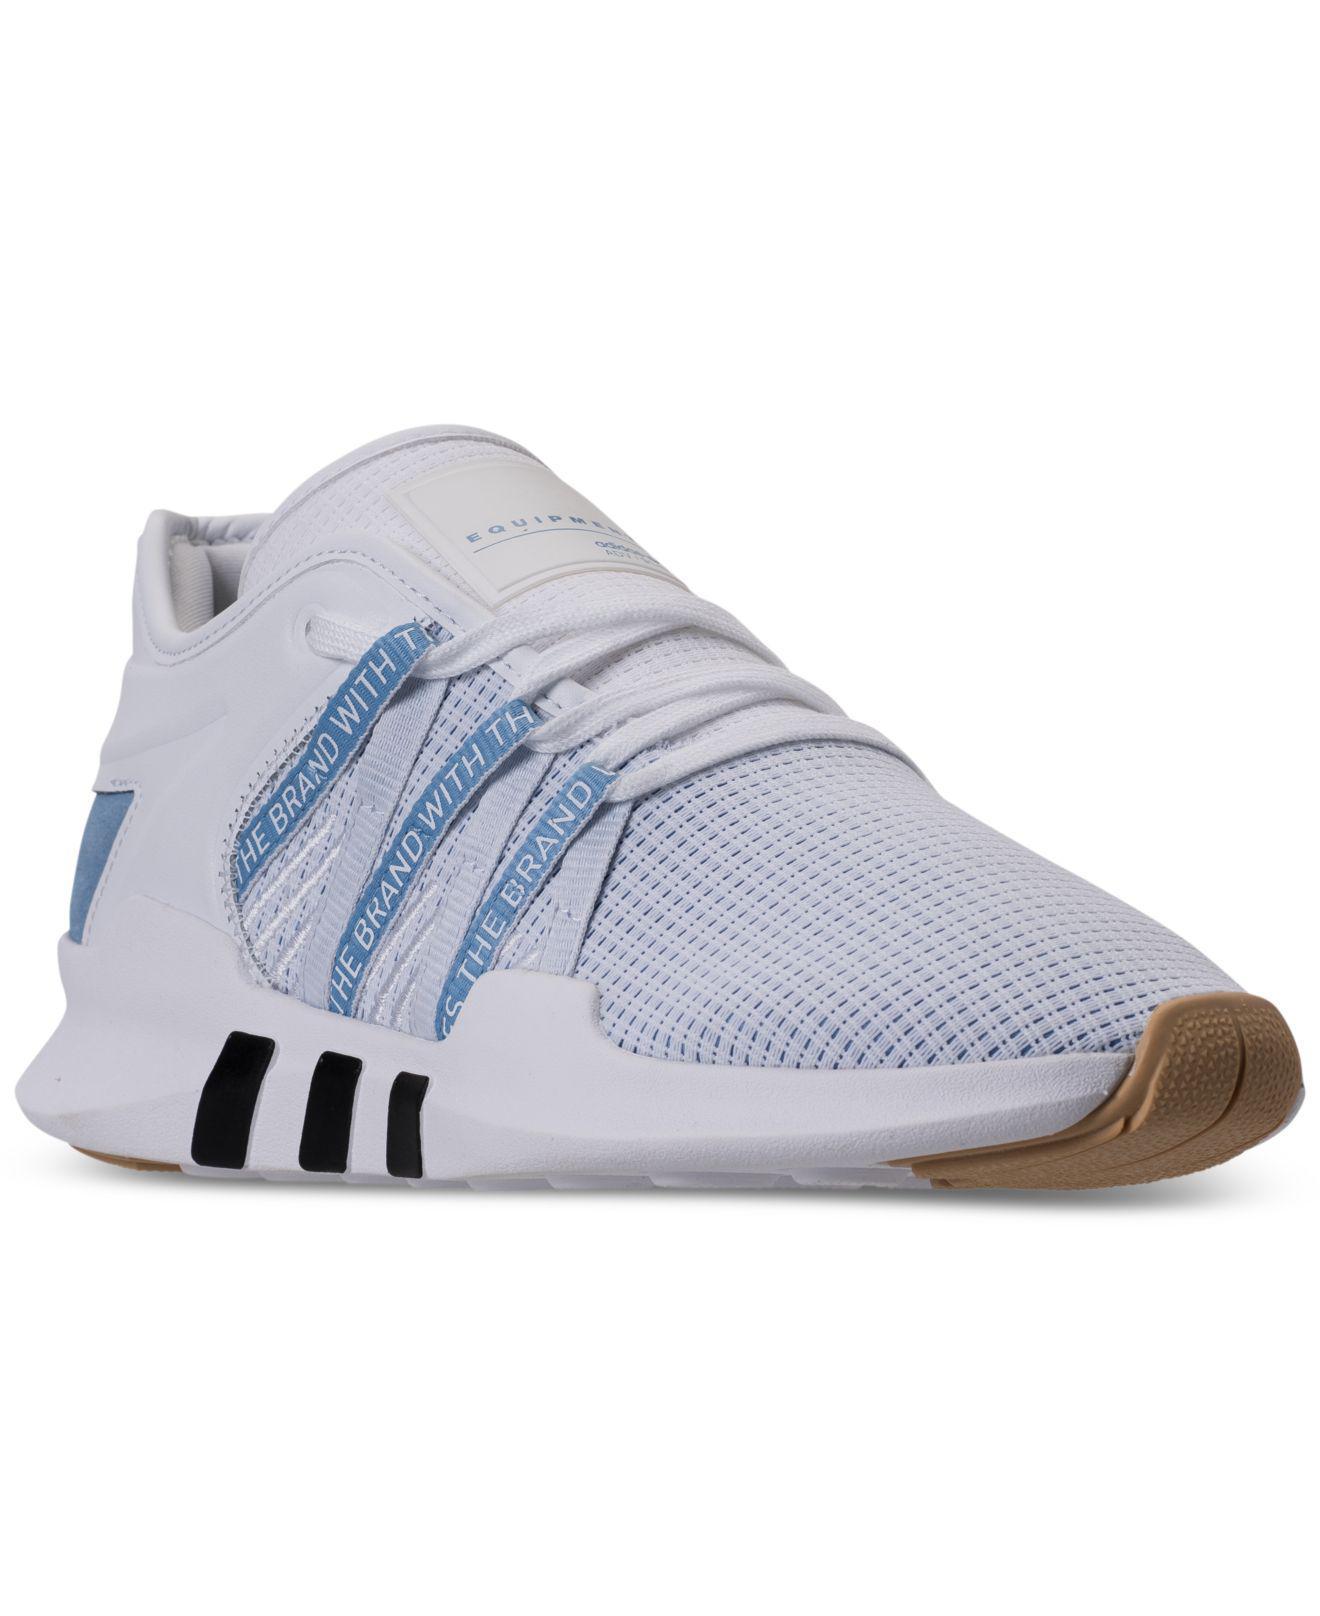 EQT Support ADV Shoes adidas UK